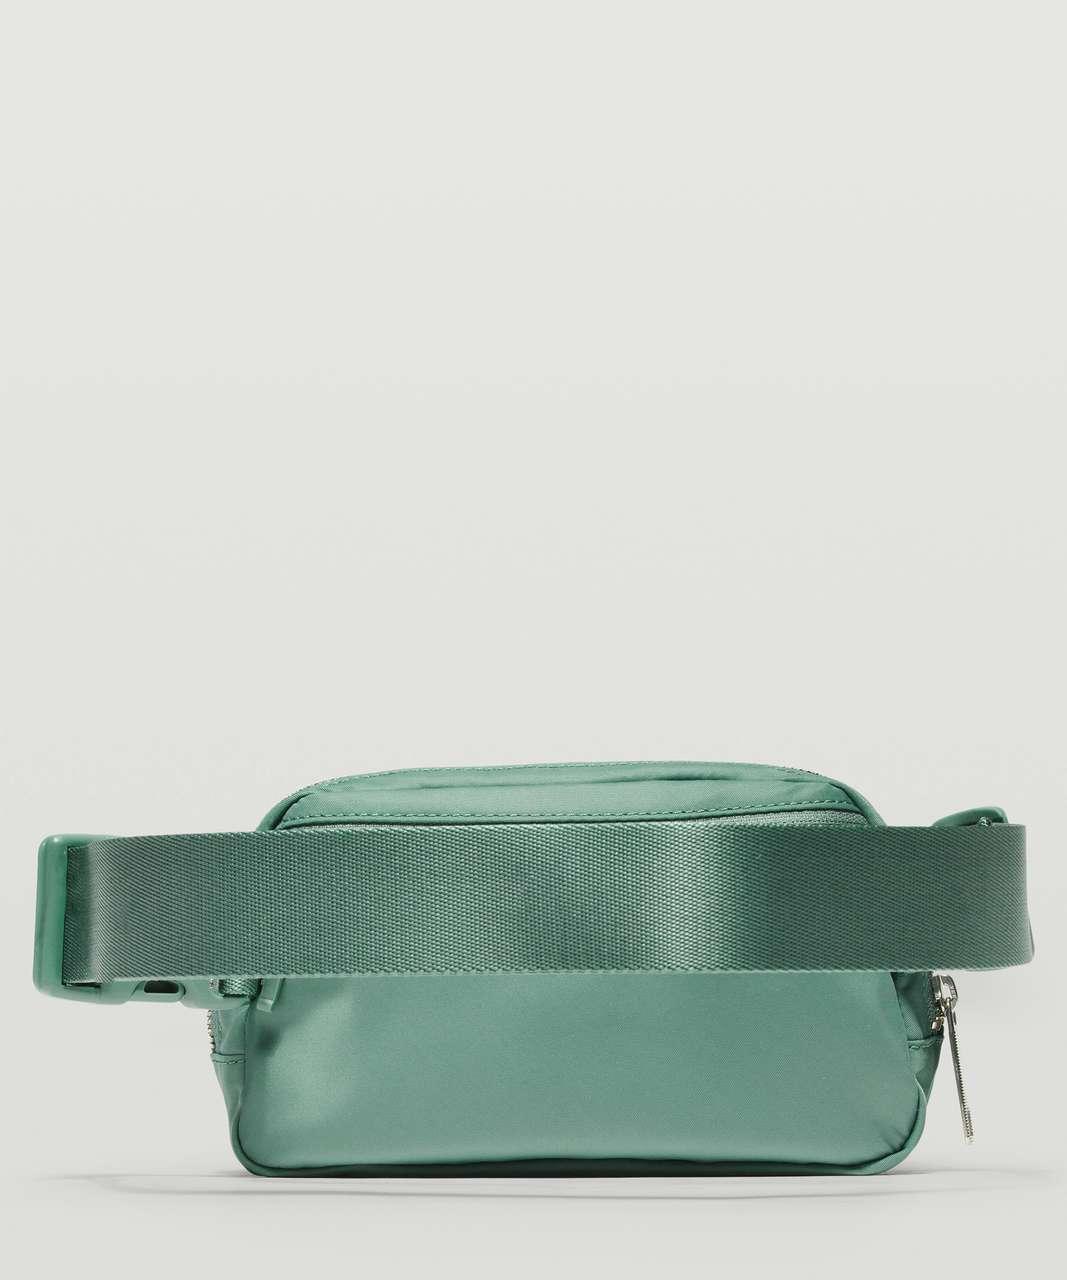 Lululemon Everywhere Belt Bag *1L - Tidewater Teal